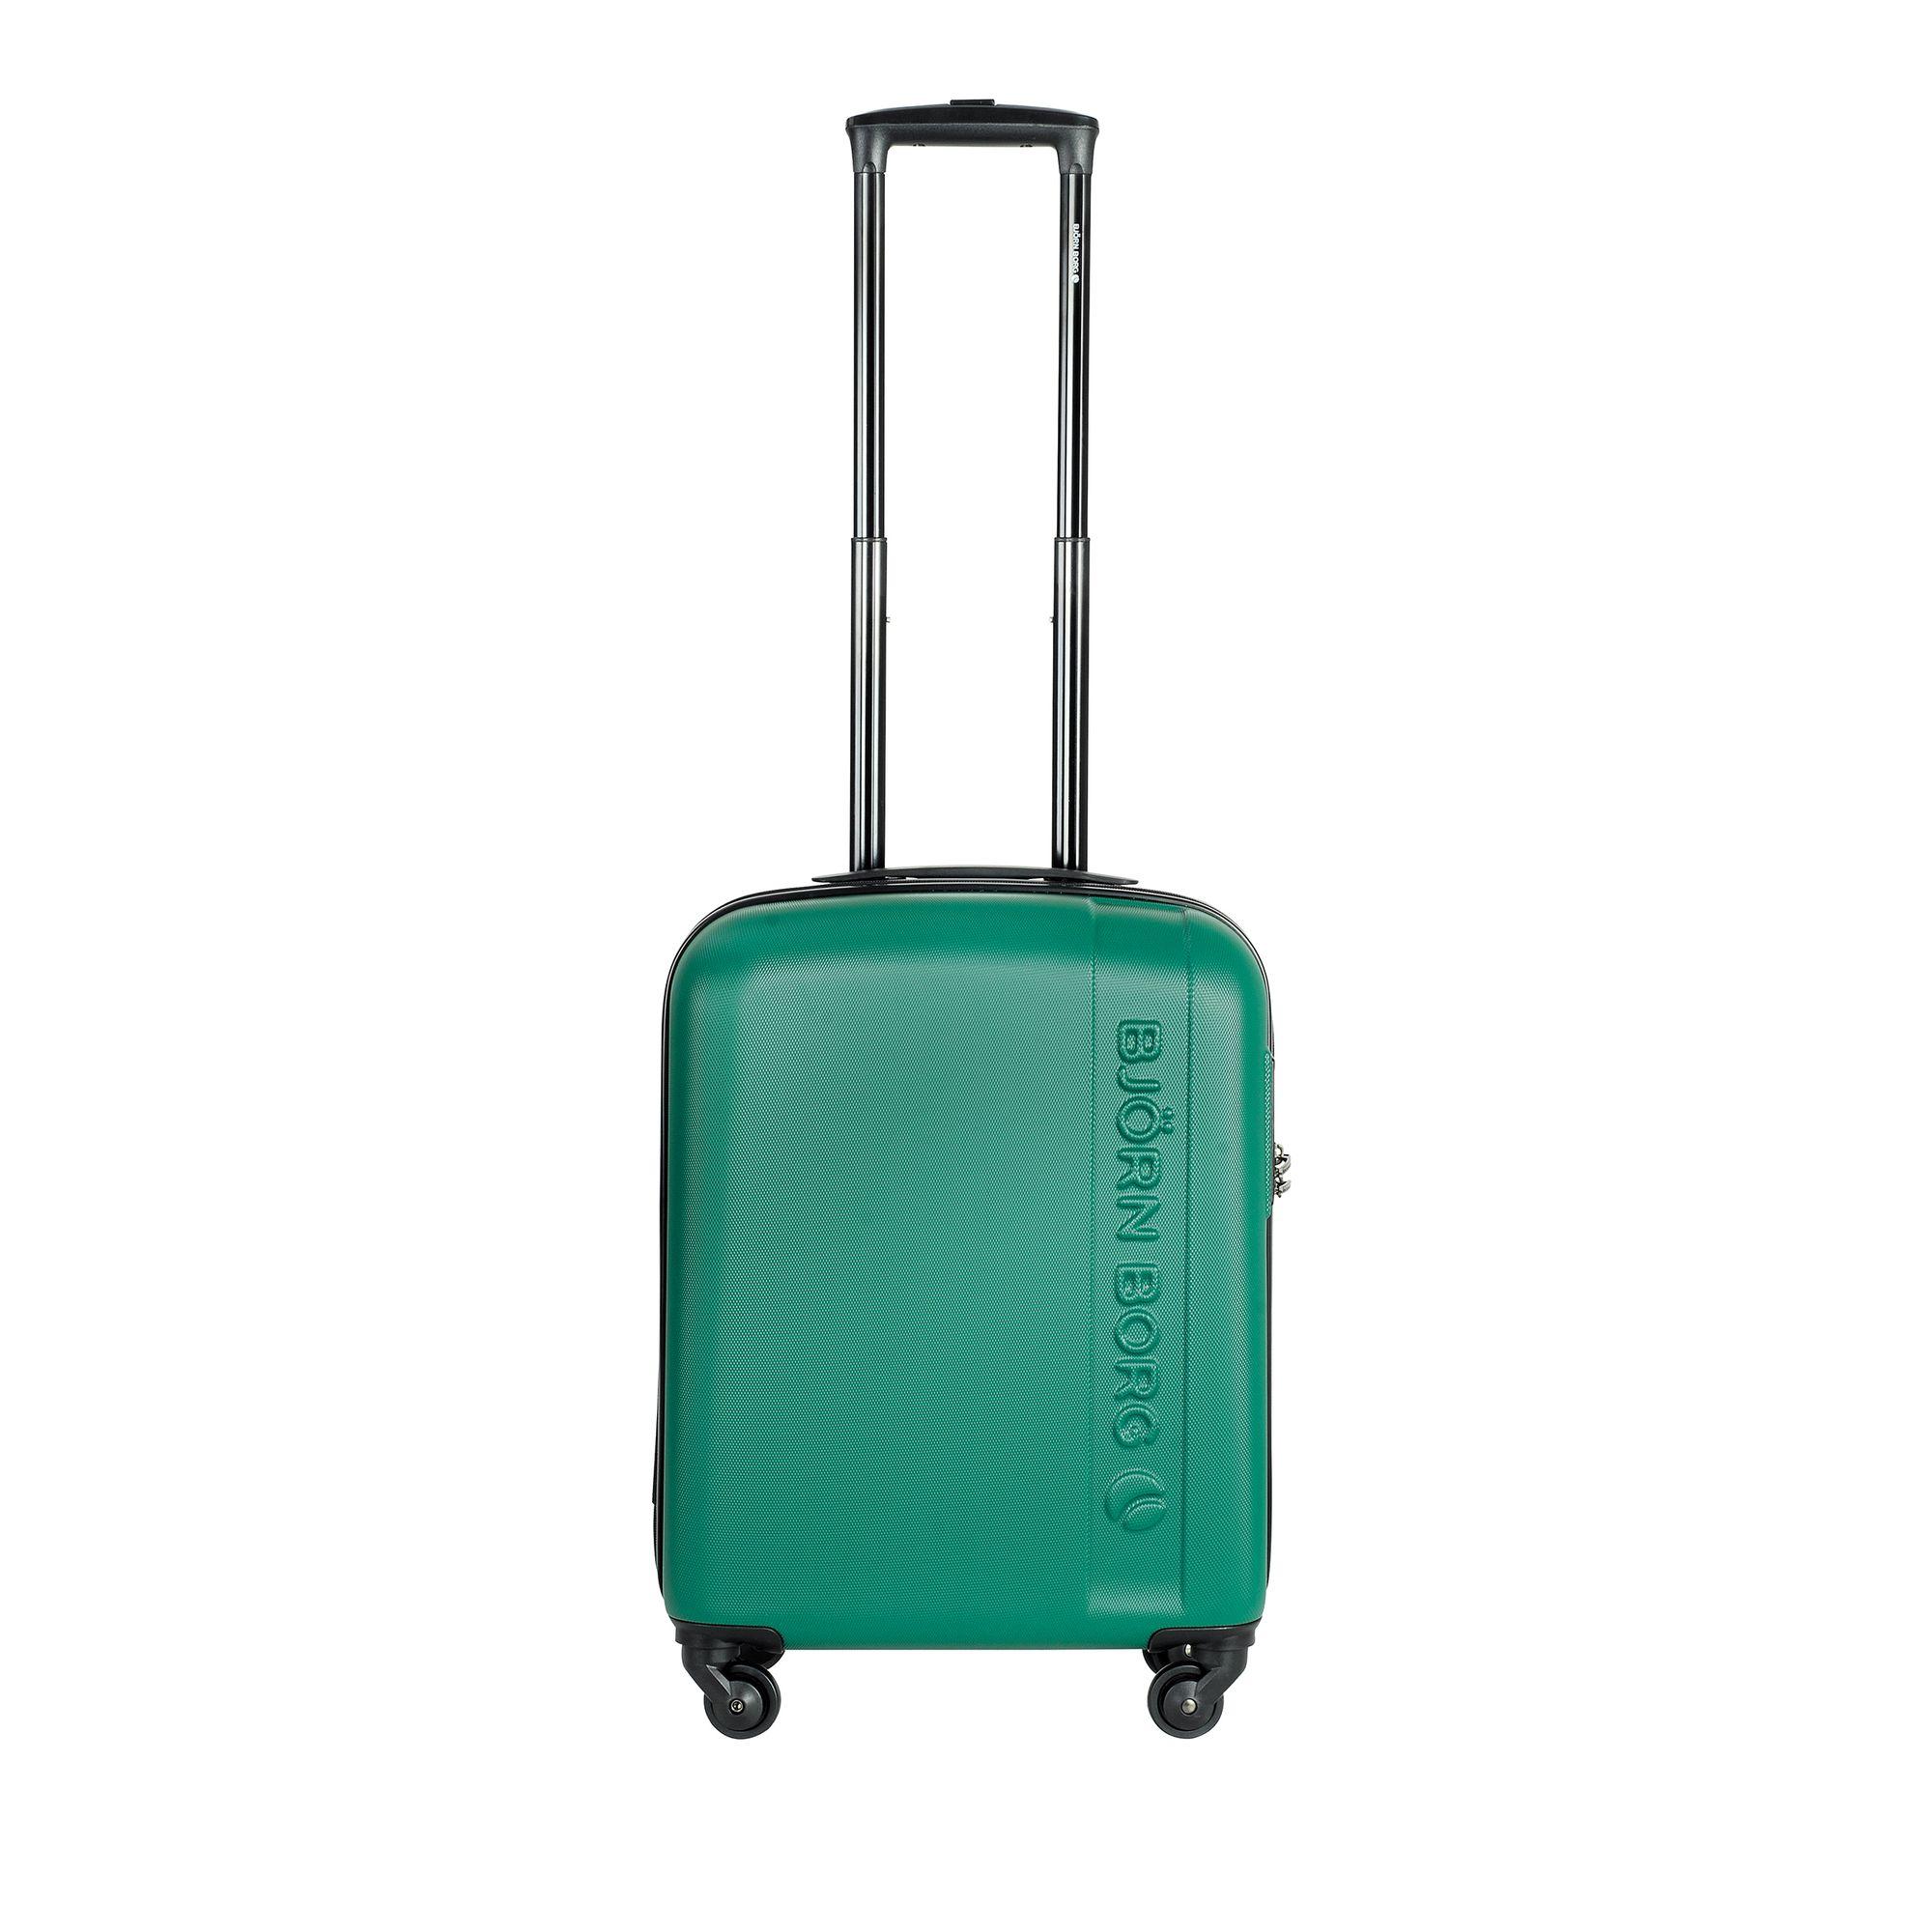 Björn Borg Hot Solid resväska, 4 hjul, 55/65/78 cm, Grön, 55cm